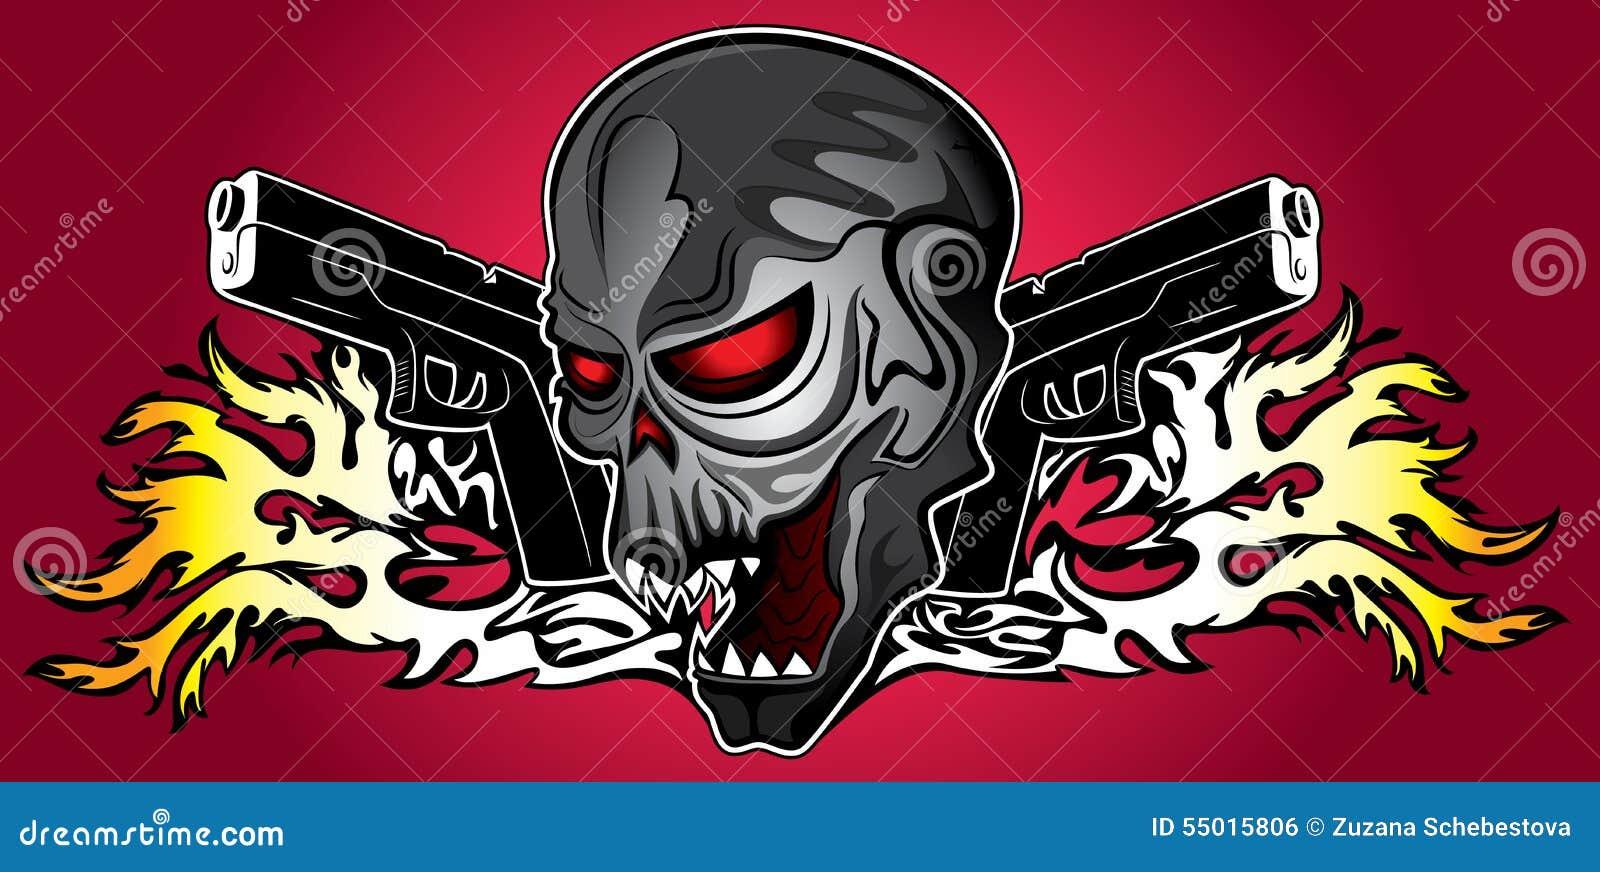 Iron terminator cyber human skull with pistols and fire flames iron terminator cyber human skull with pistols and fire flames background voltagebd Gallery